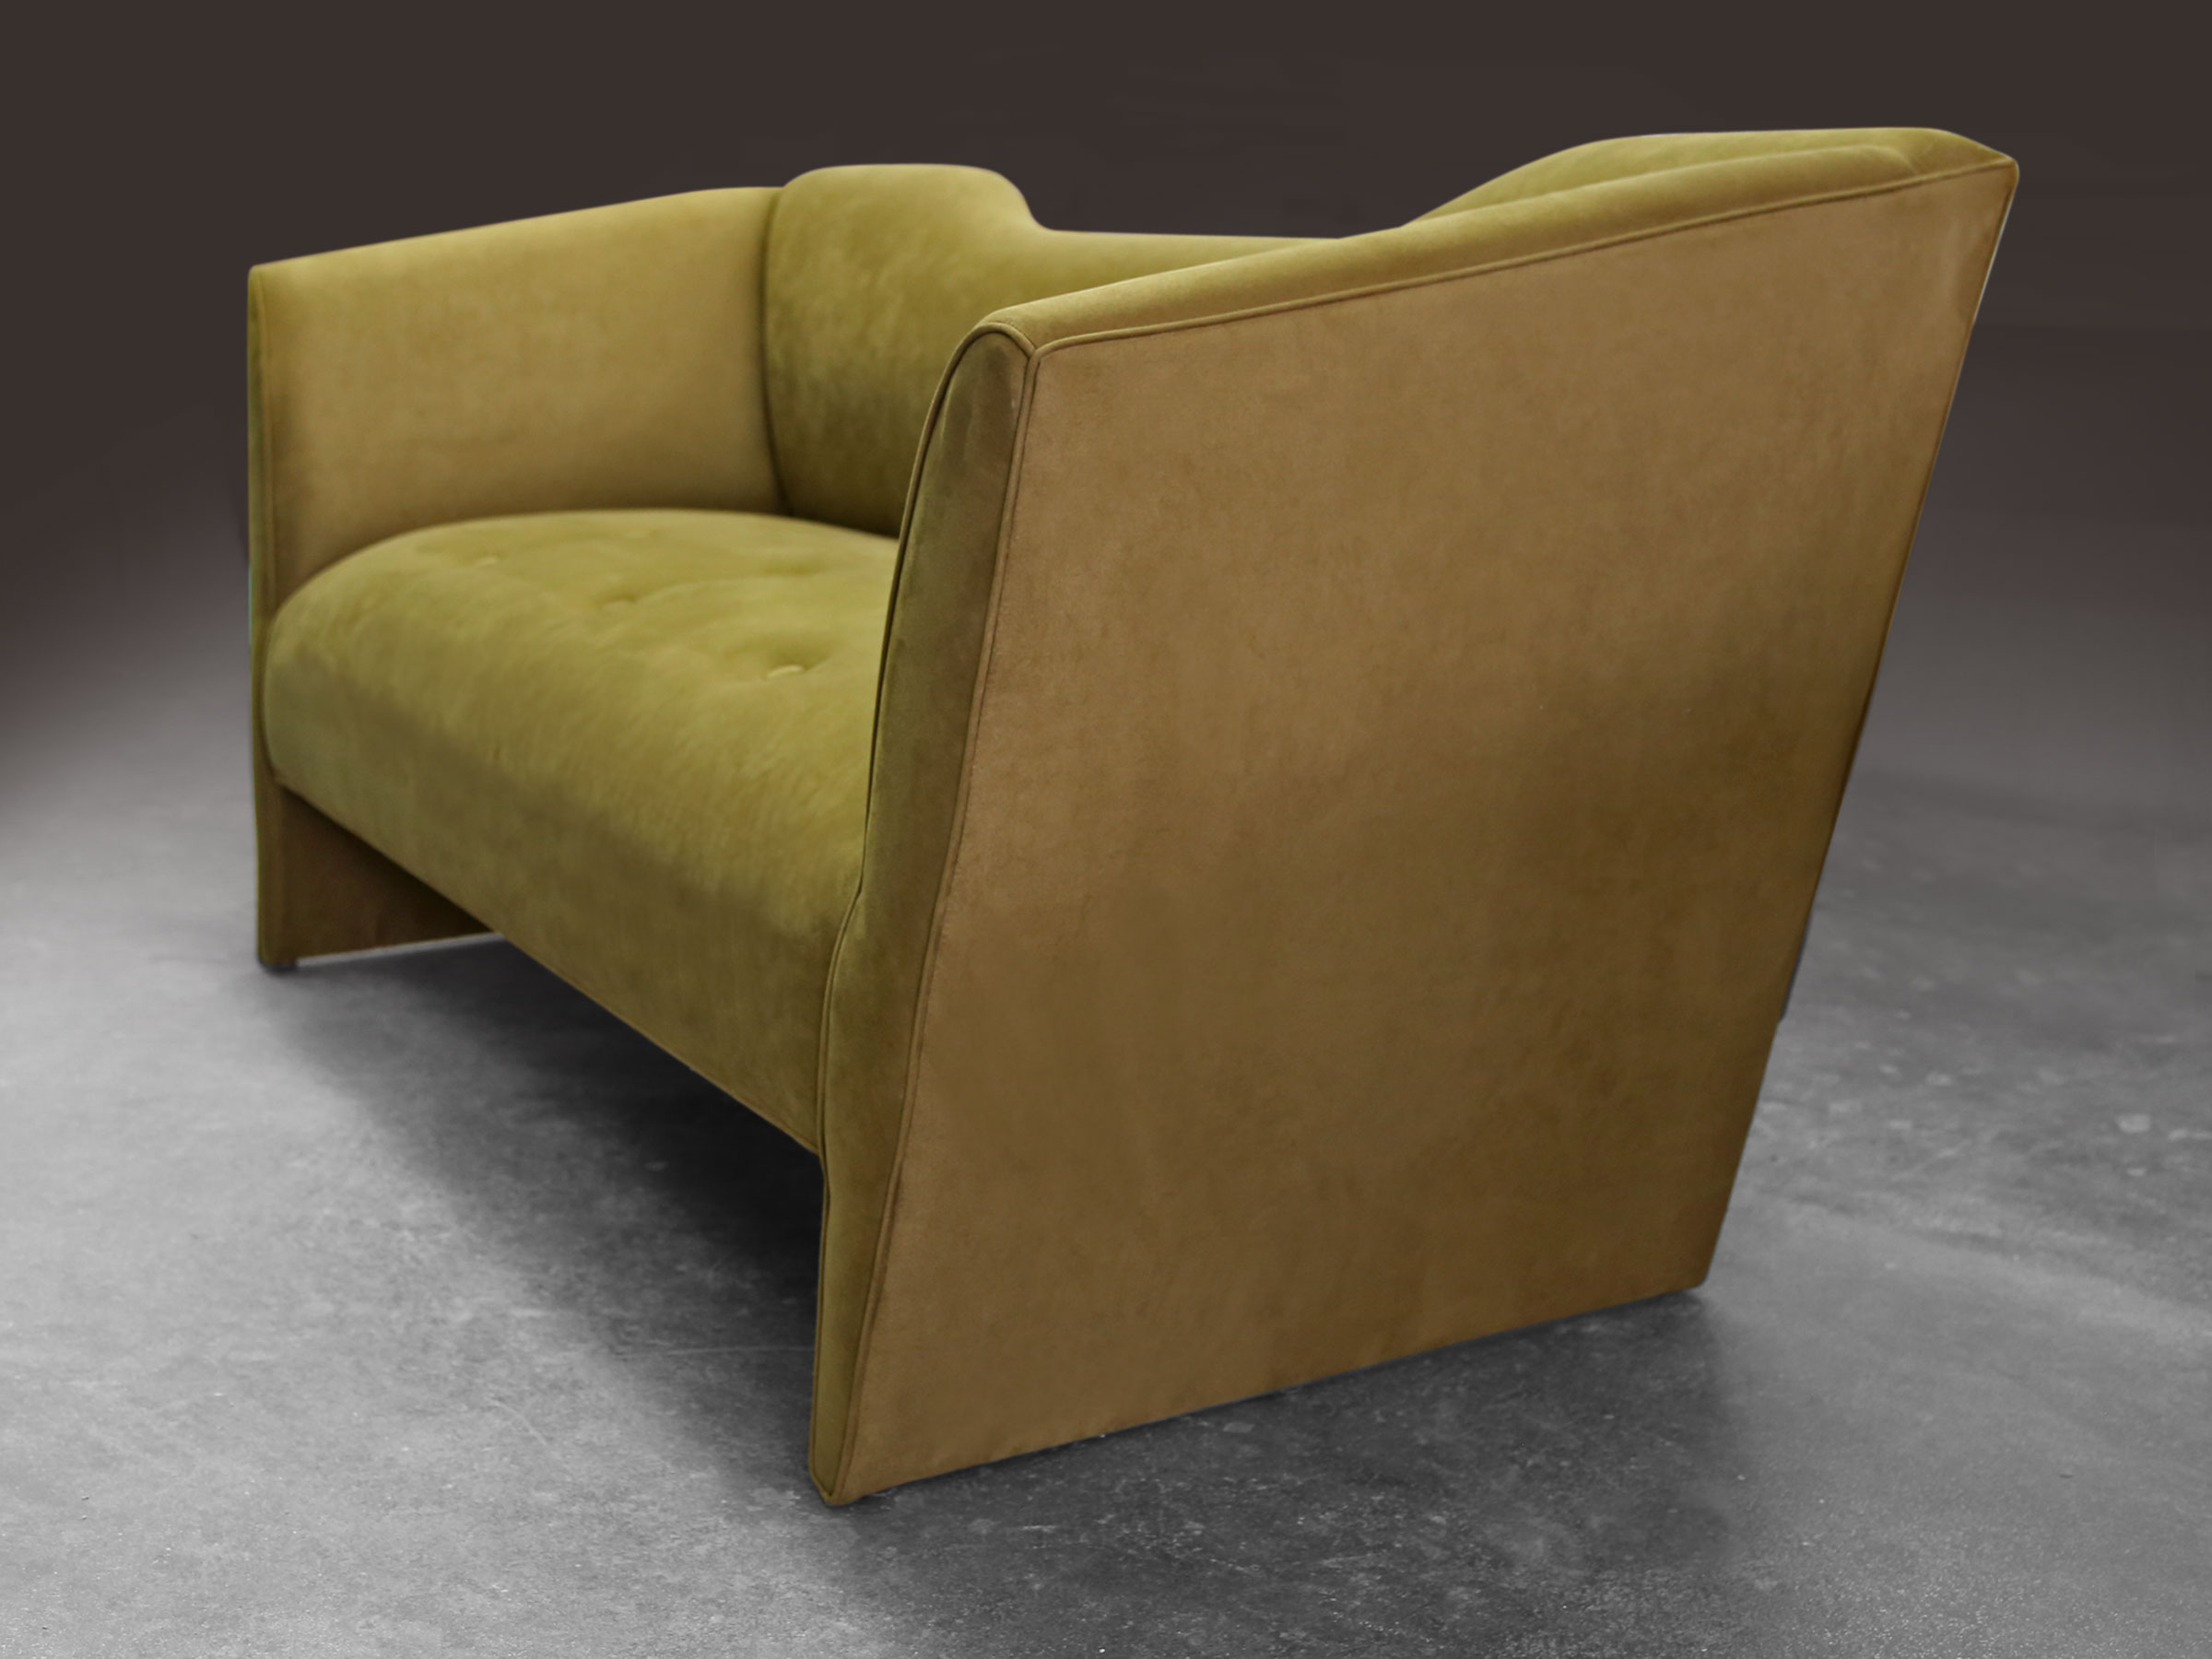 Nersi Sofa by Sentient